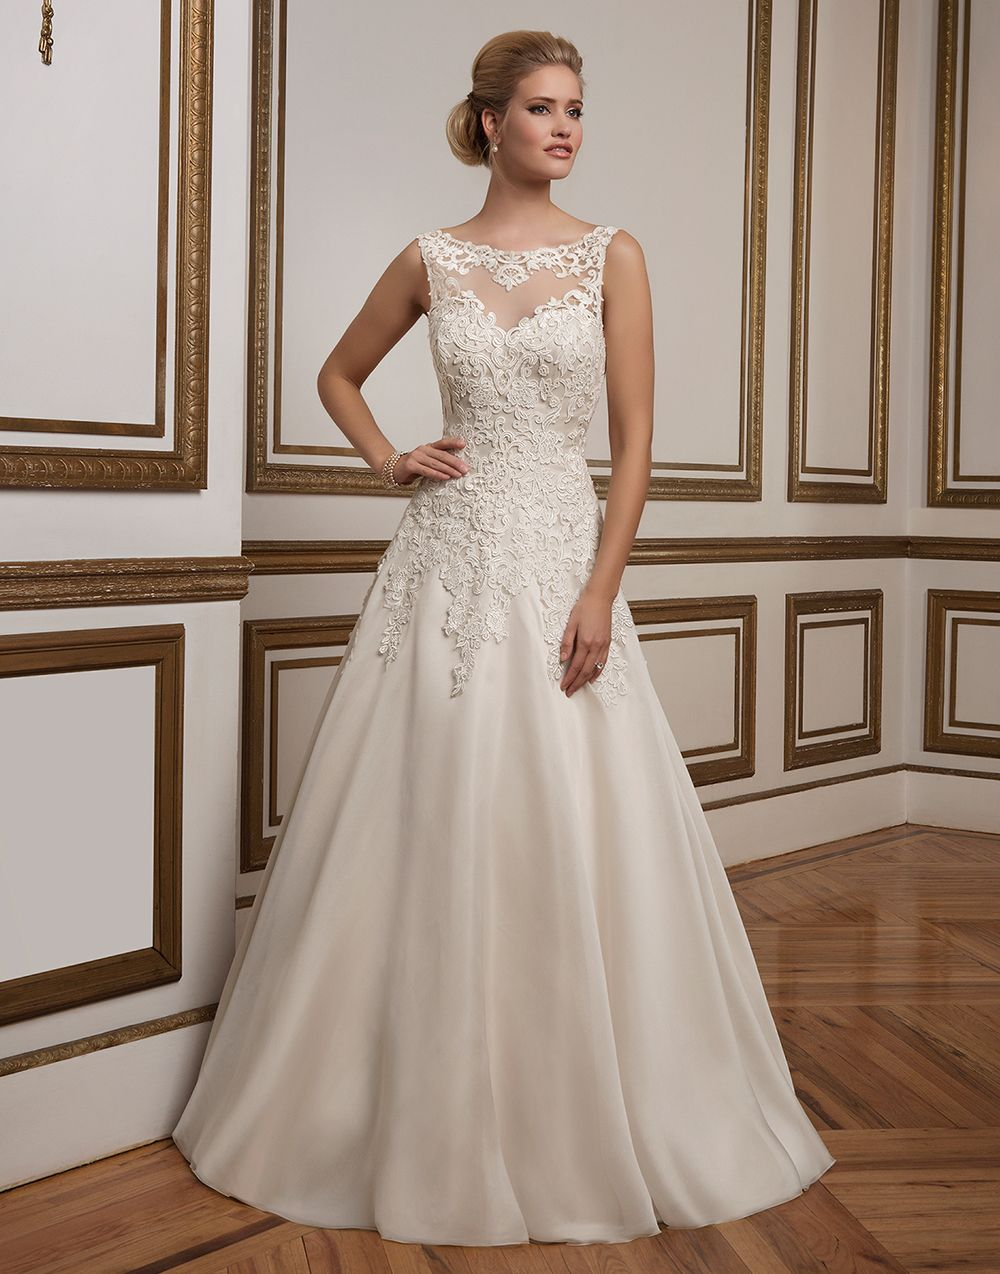 Justin Alexander wedding dresses style 8835 | Illusion neckline ...